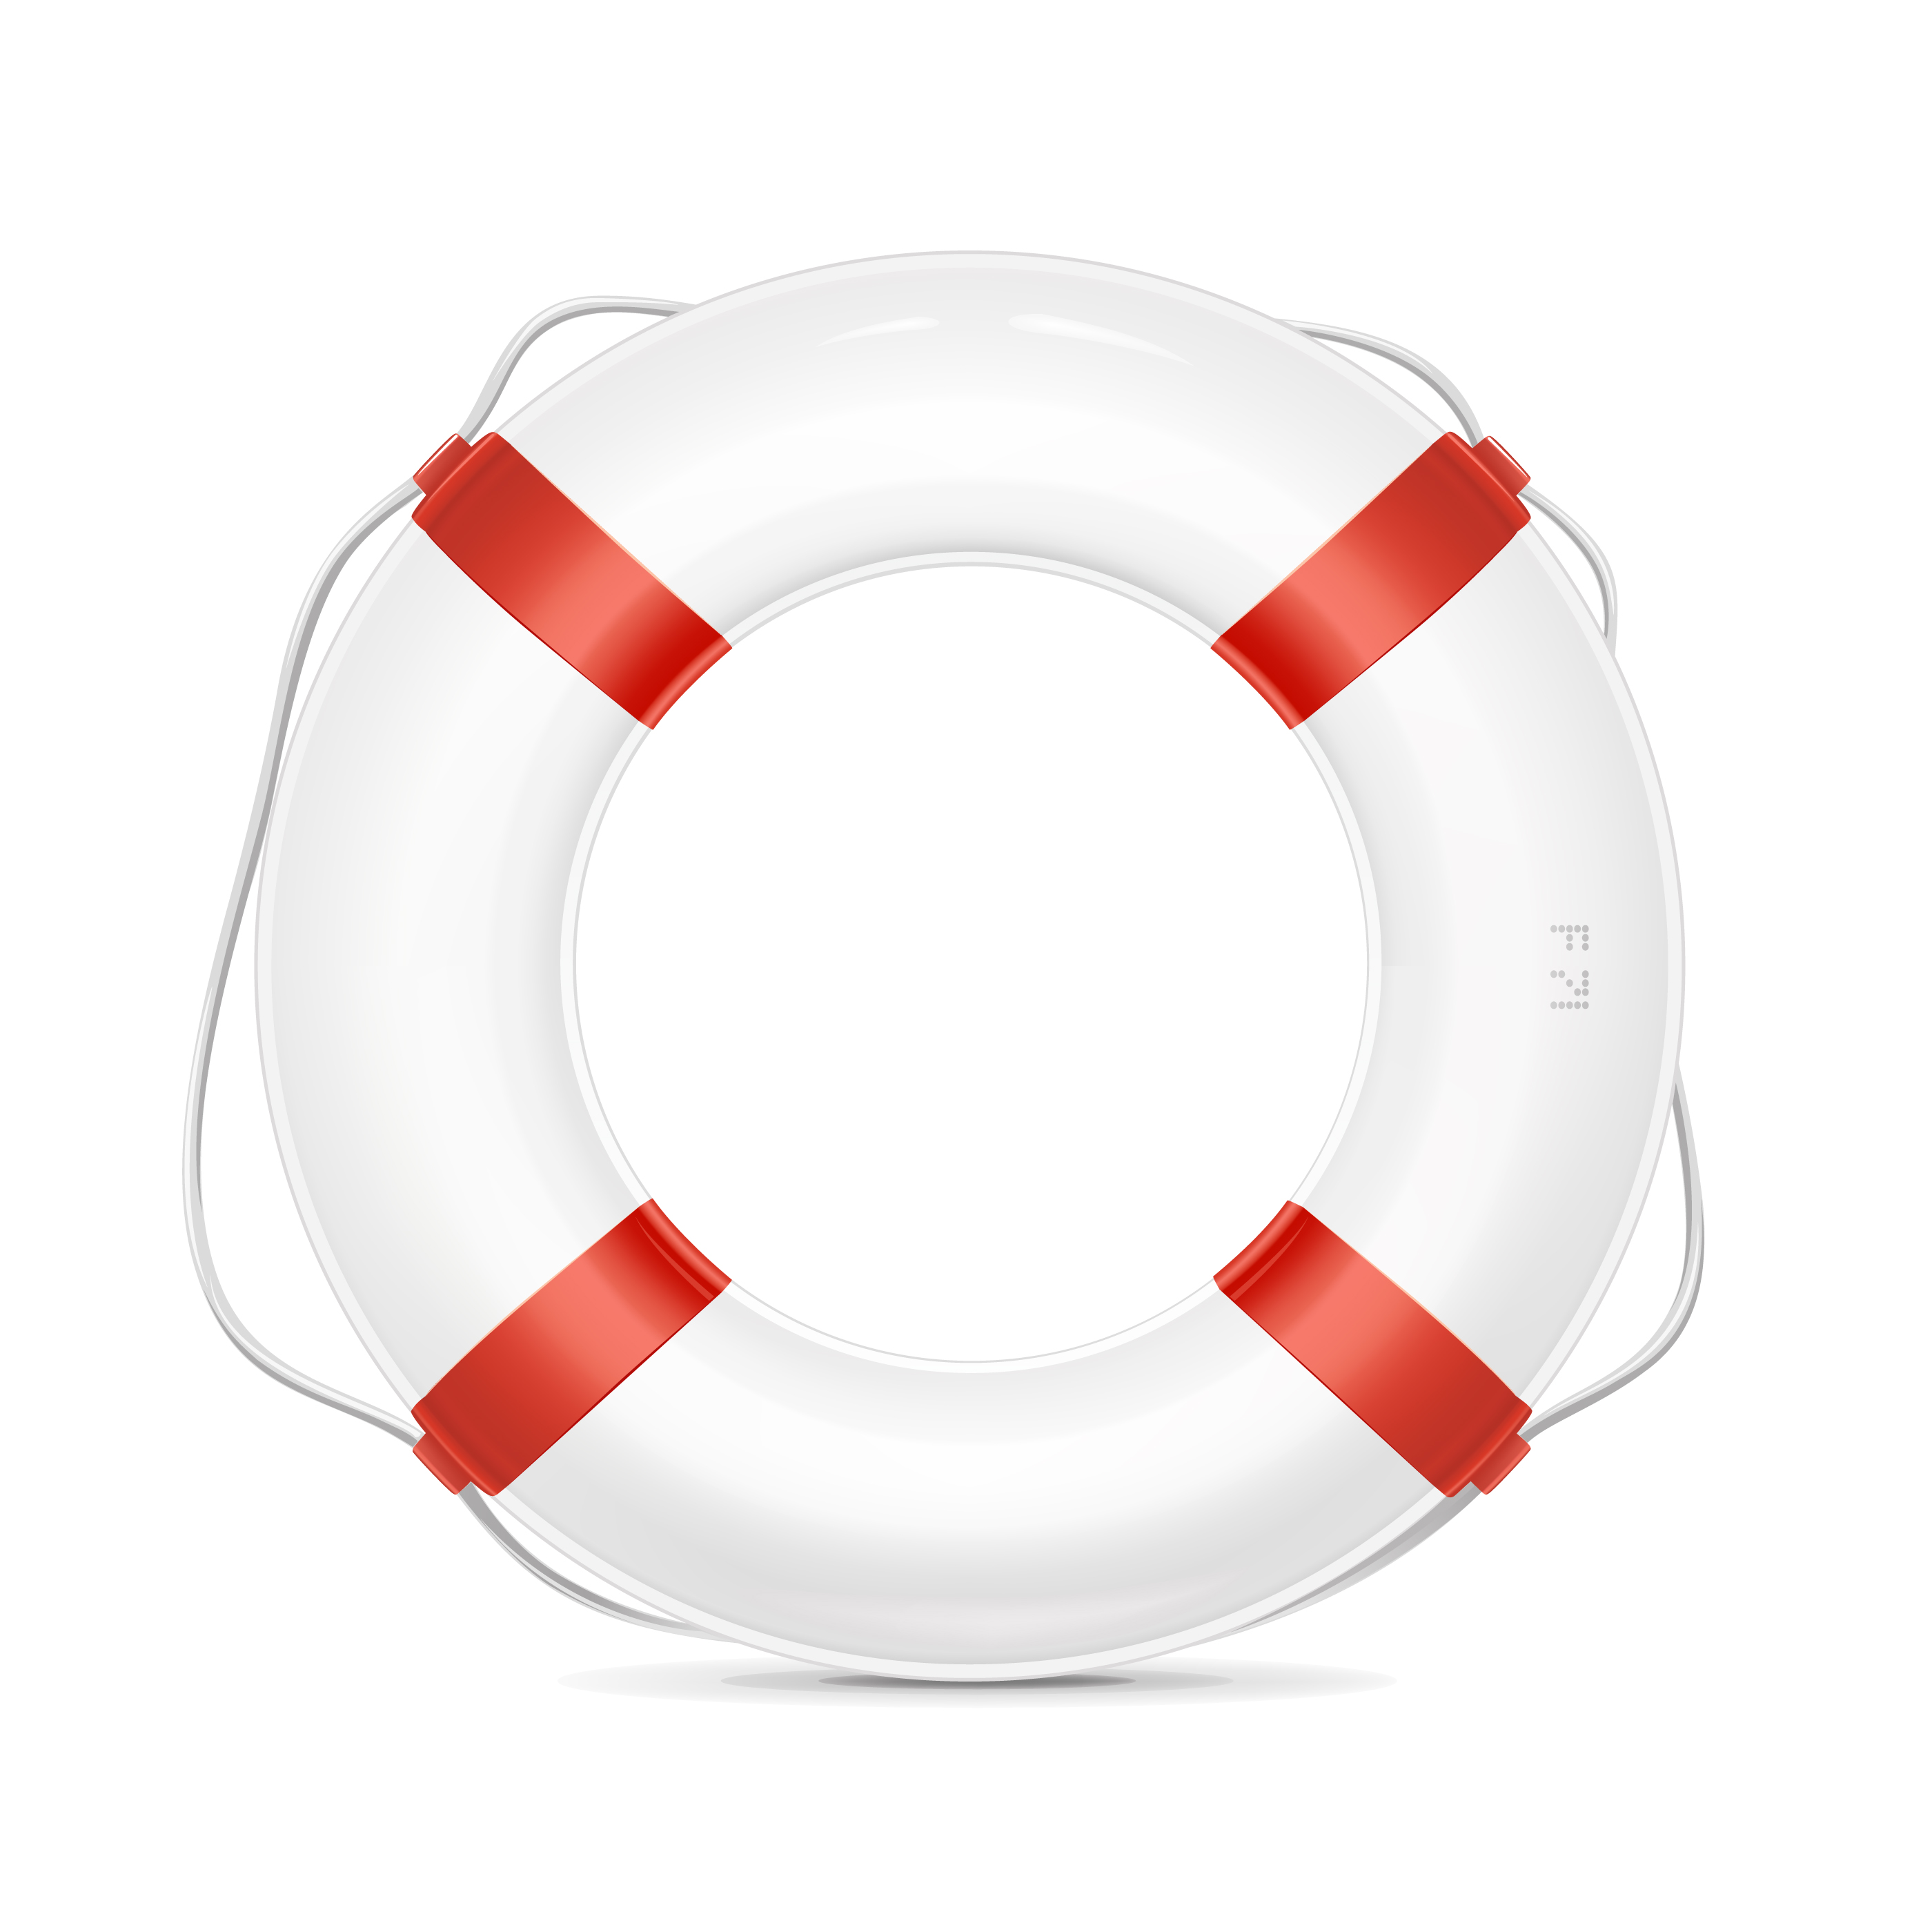 Vector illustration of a lifebuoy